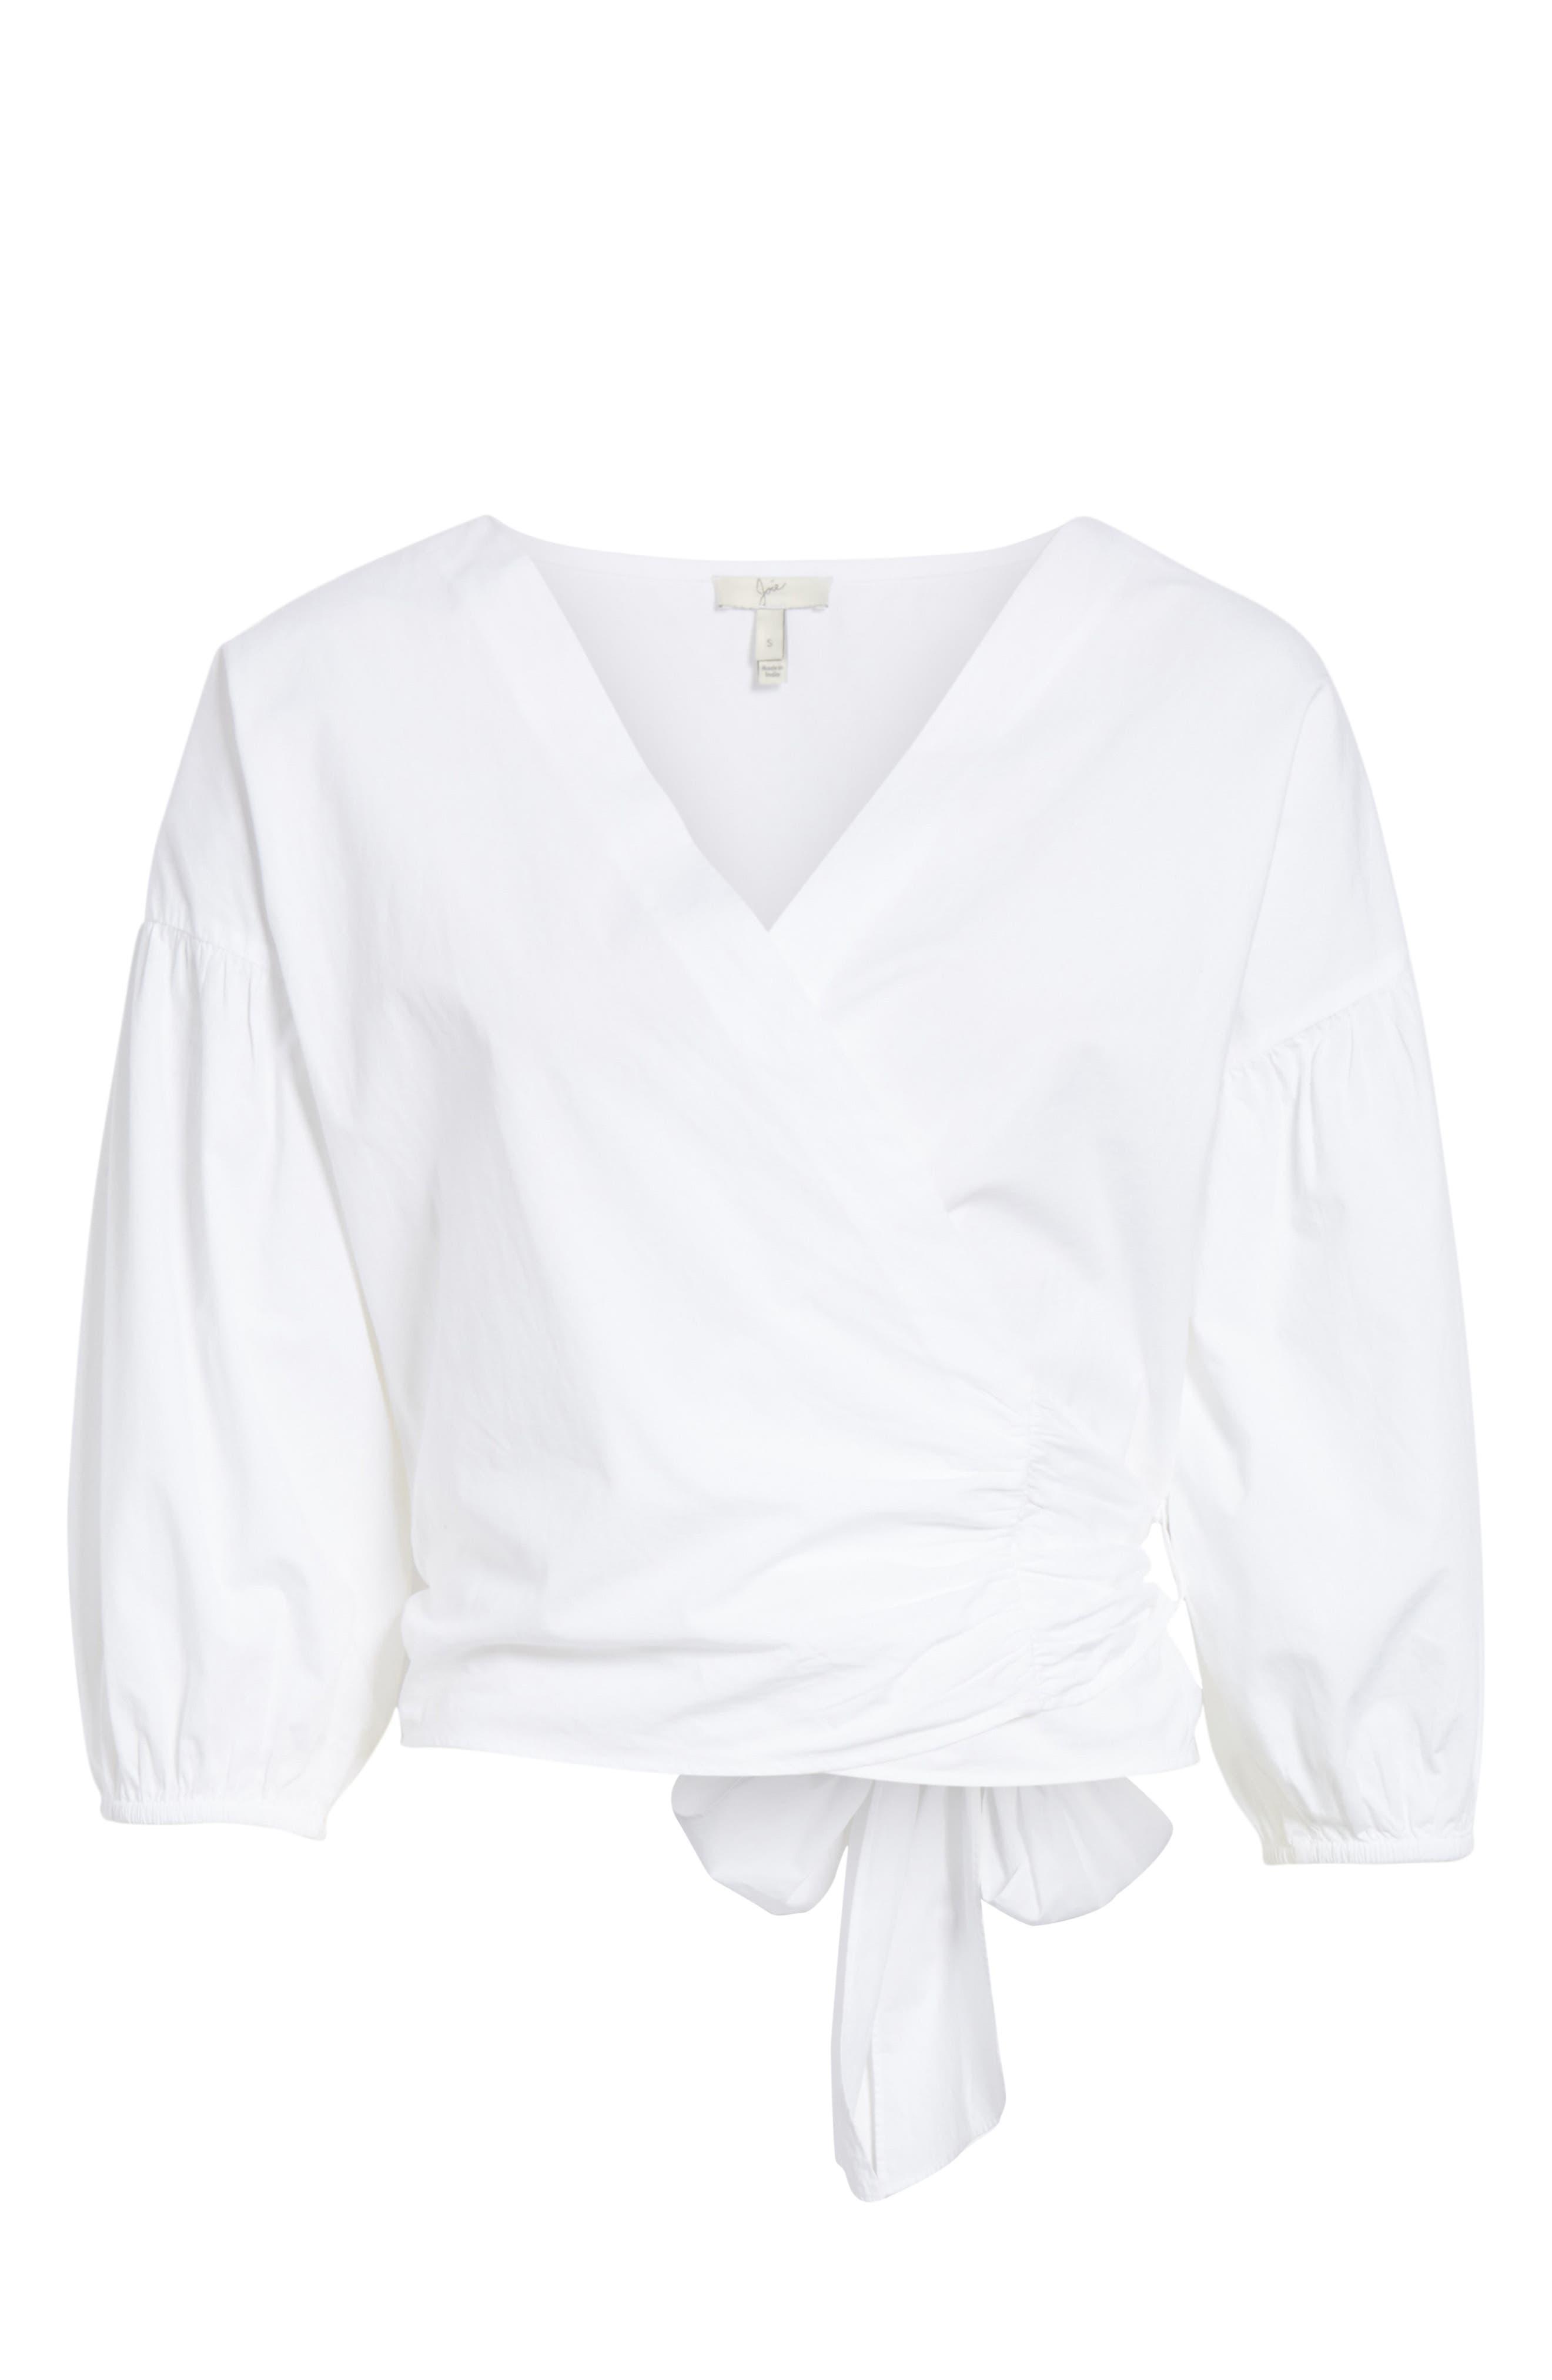 Hausu Bow Back Blouse,                             Alternate thumbnail 6, color,                             Clean White